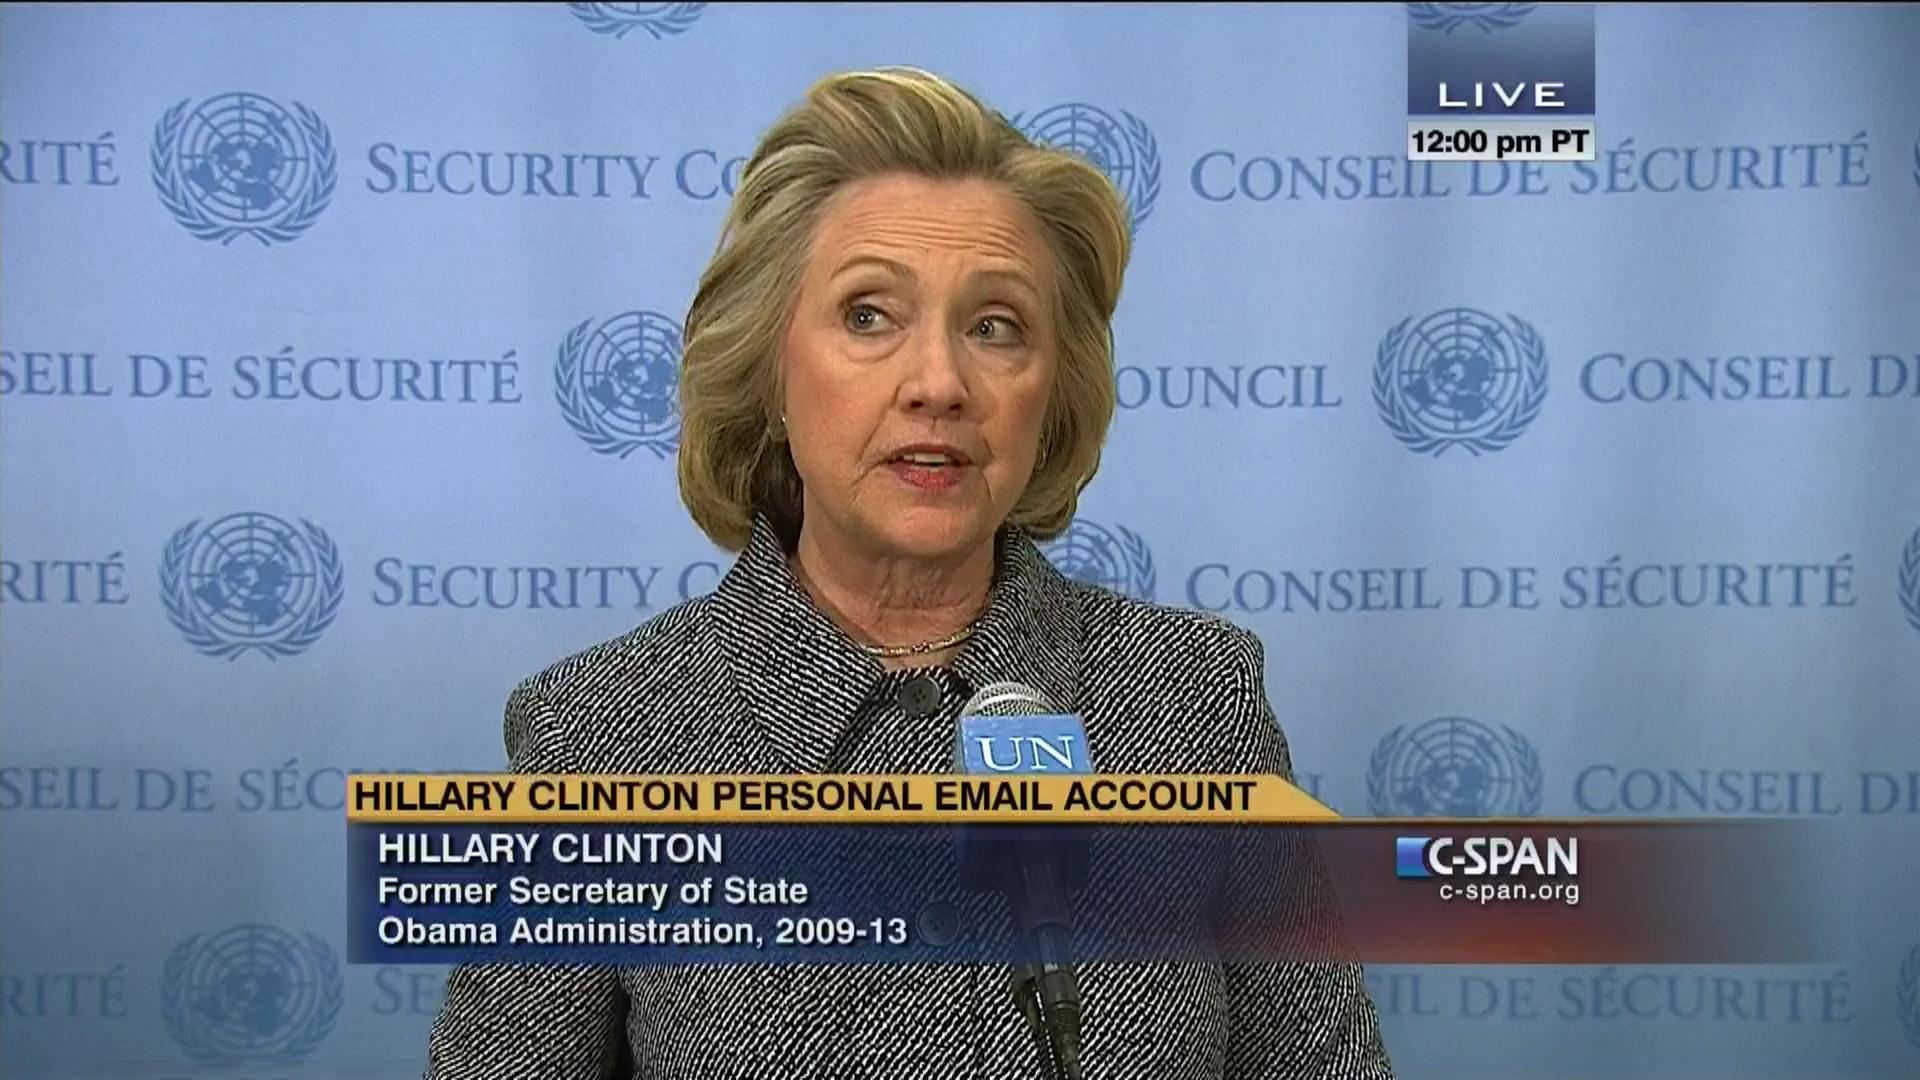 Hillary clinton news conference mar 10 2015 video c span aljukfo Choice Image